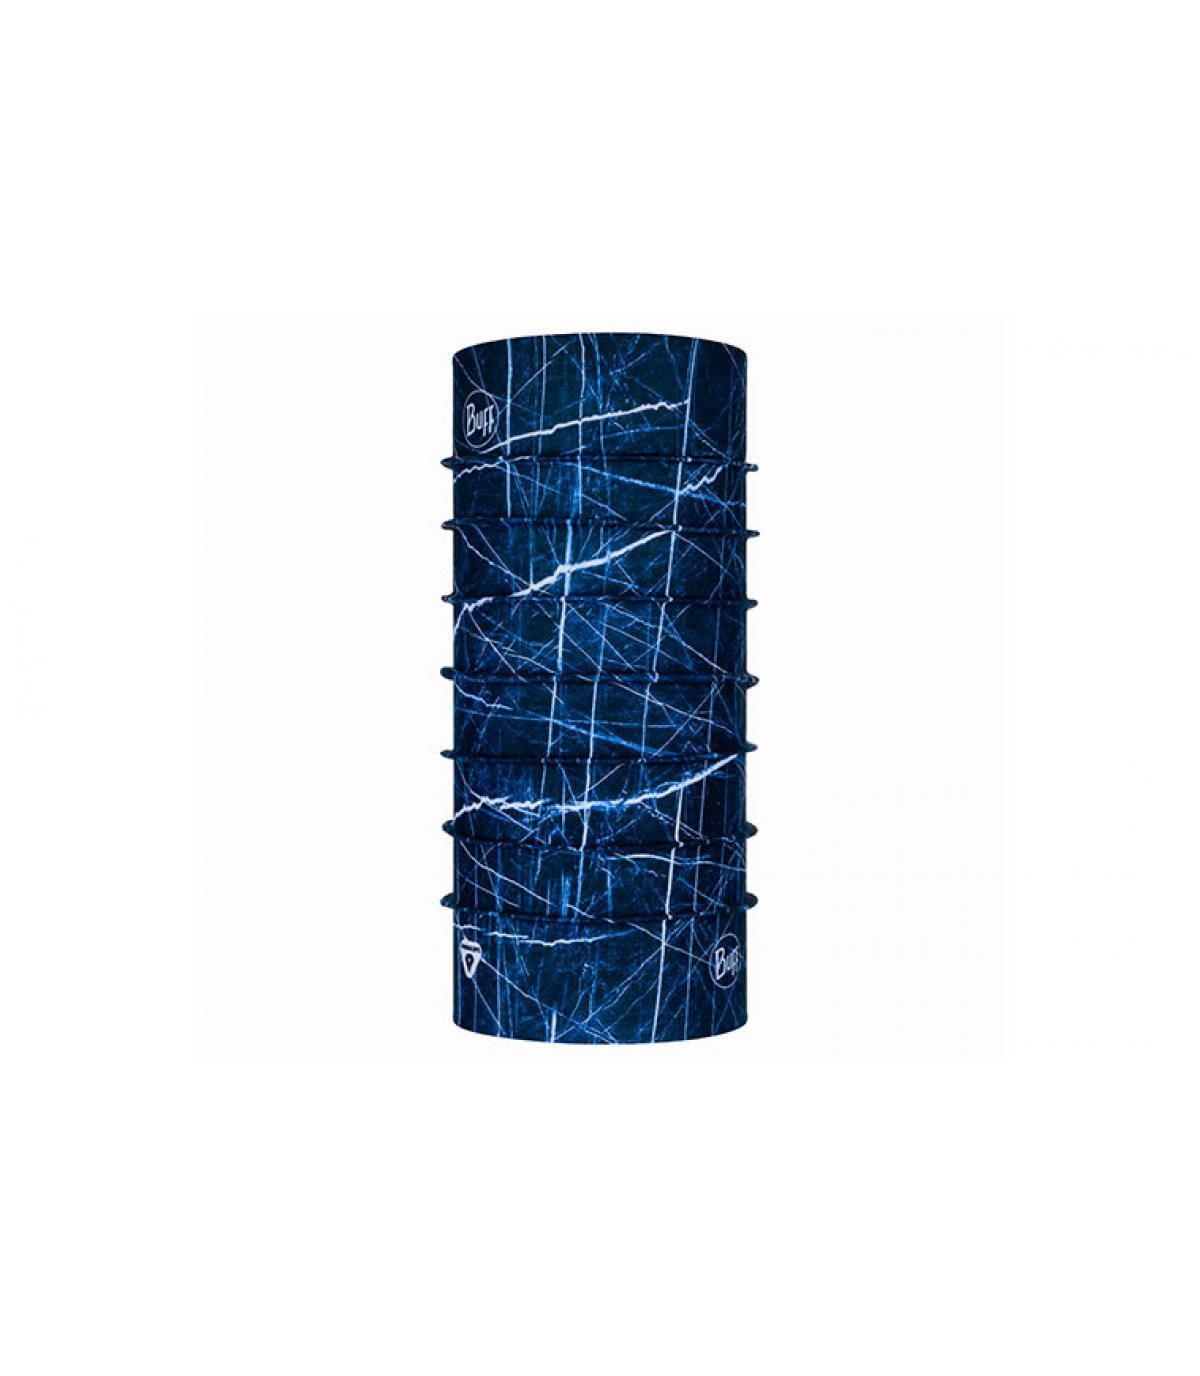 Buff calido espampado azul